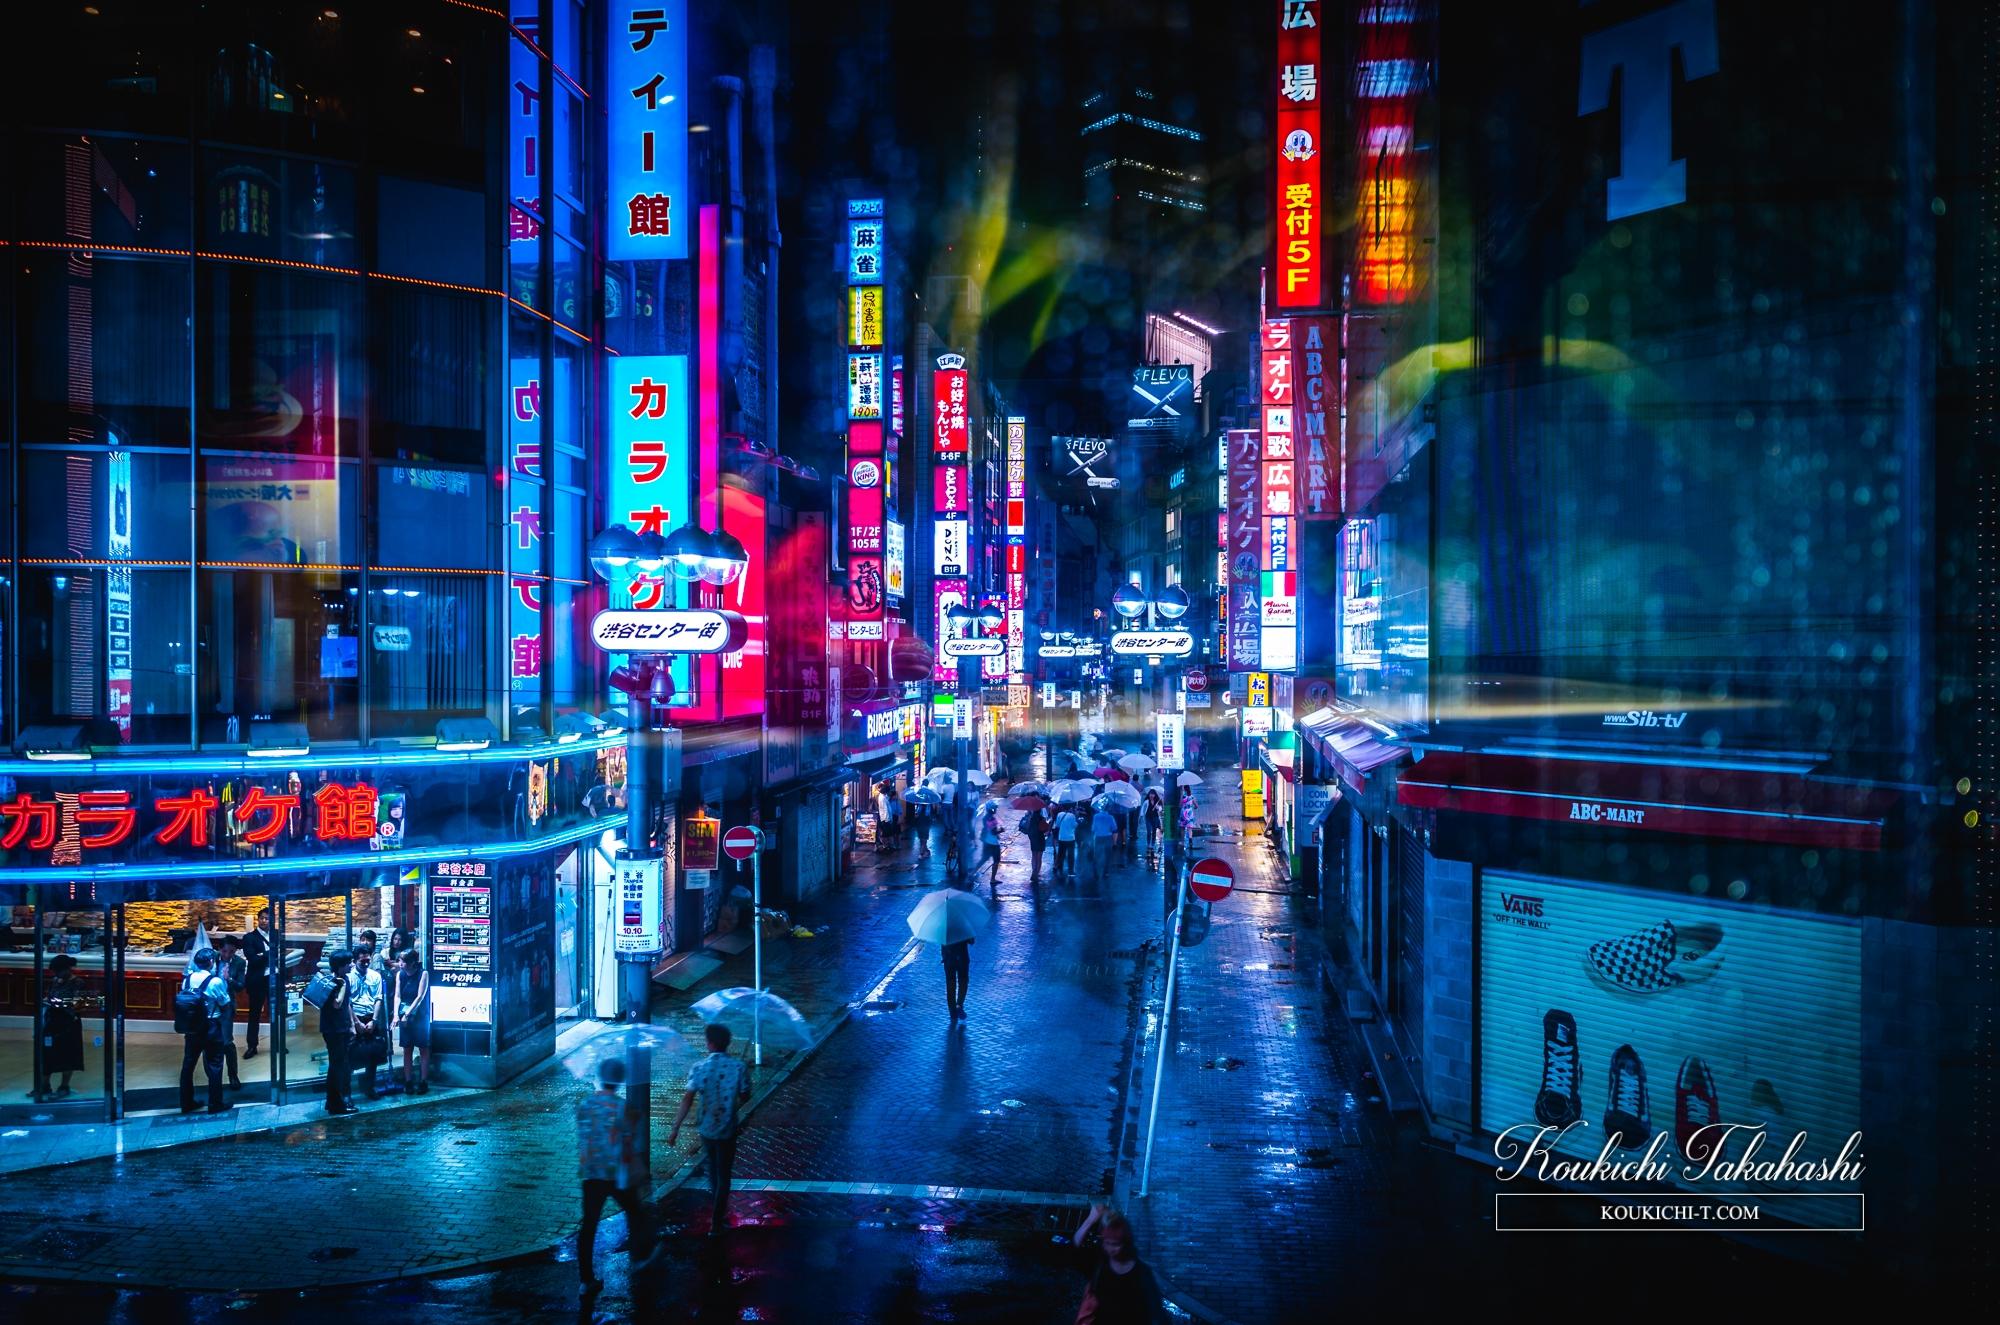 Adobe Lightroom 写真現像レタッチサンプル Before After ガラス越しの雨の渋谷センター街 tokyo freelance photographer